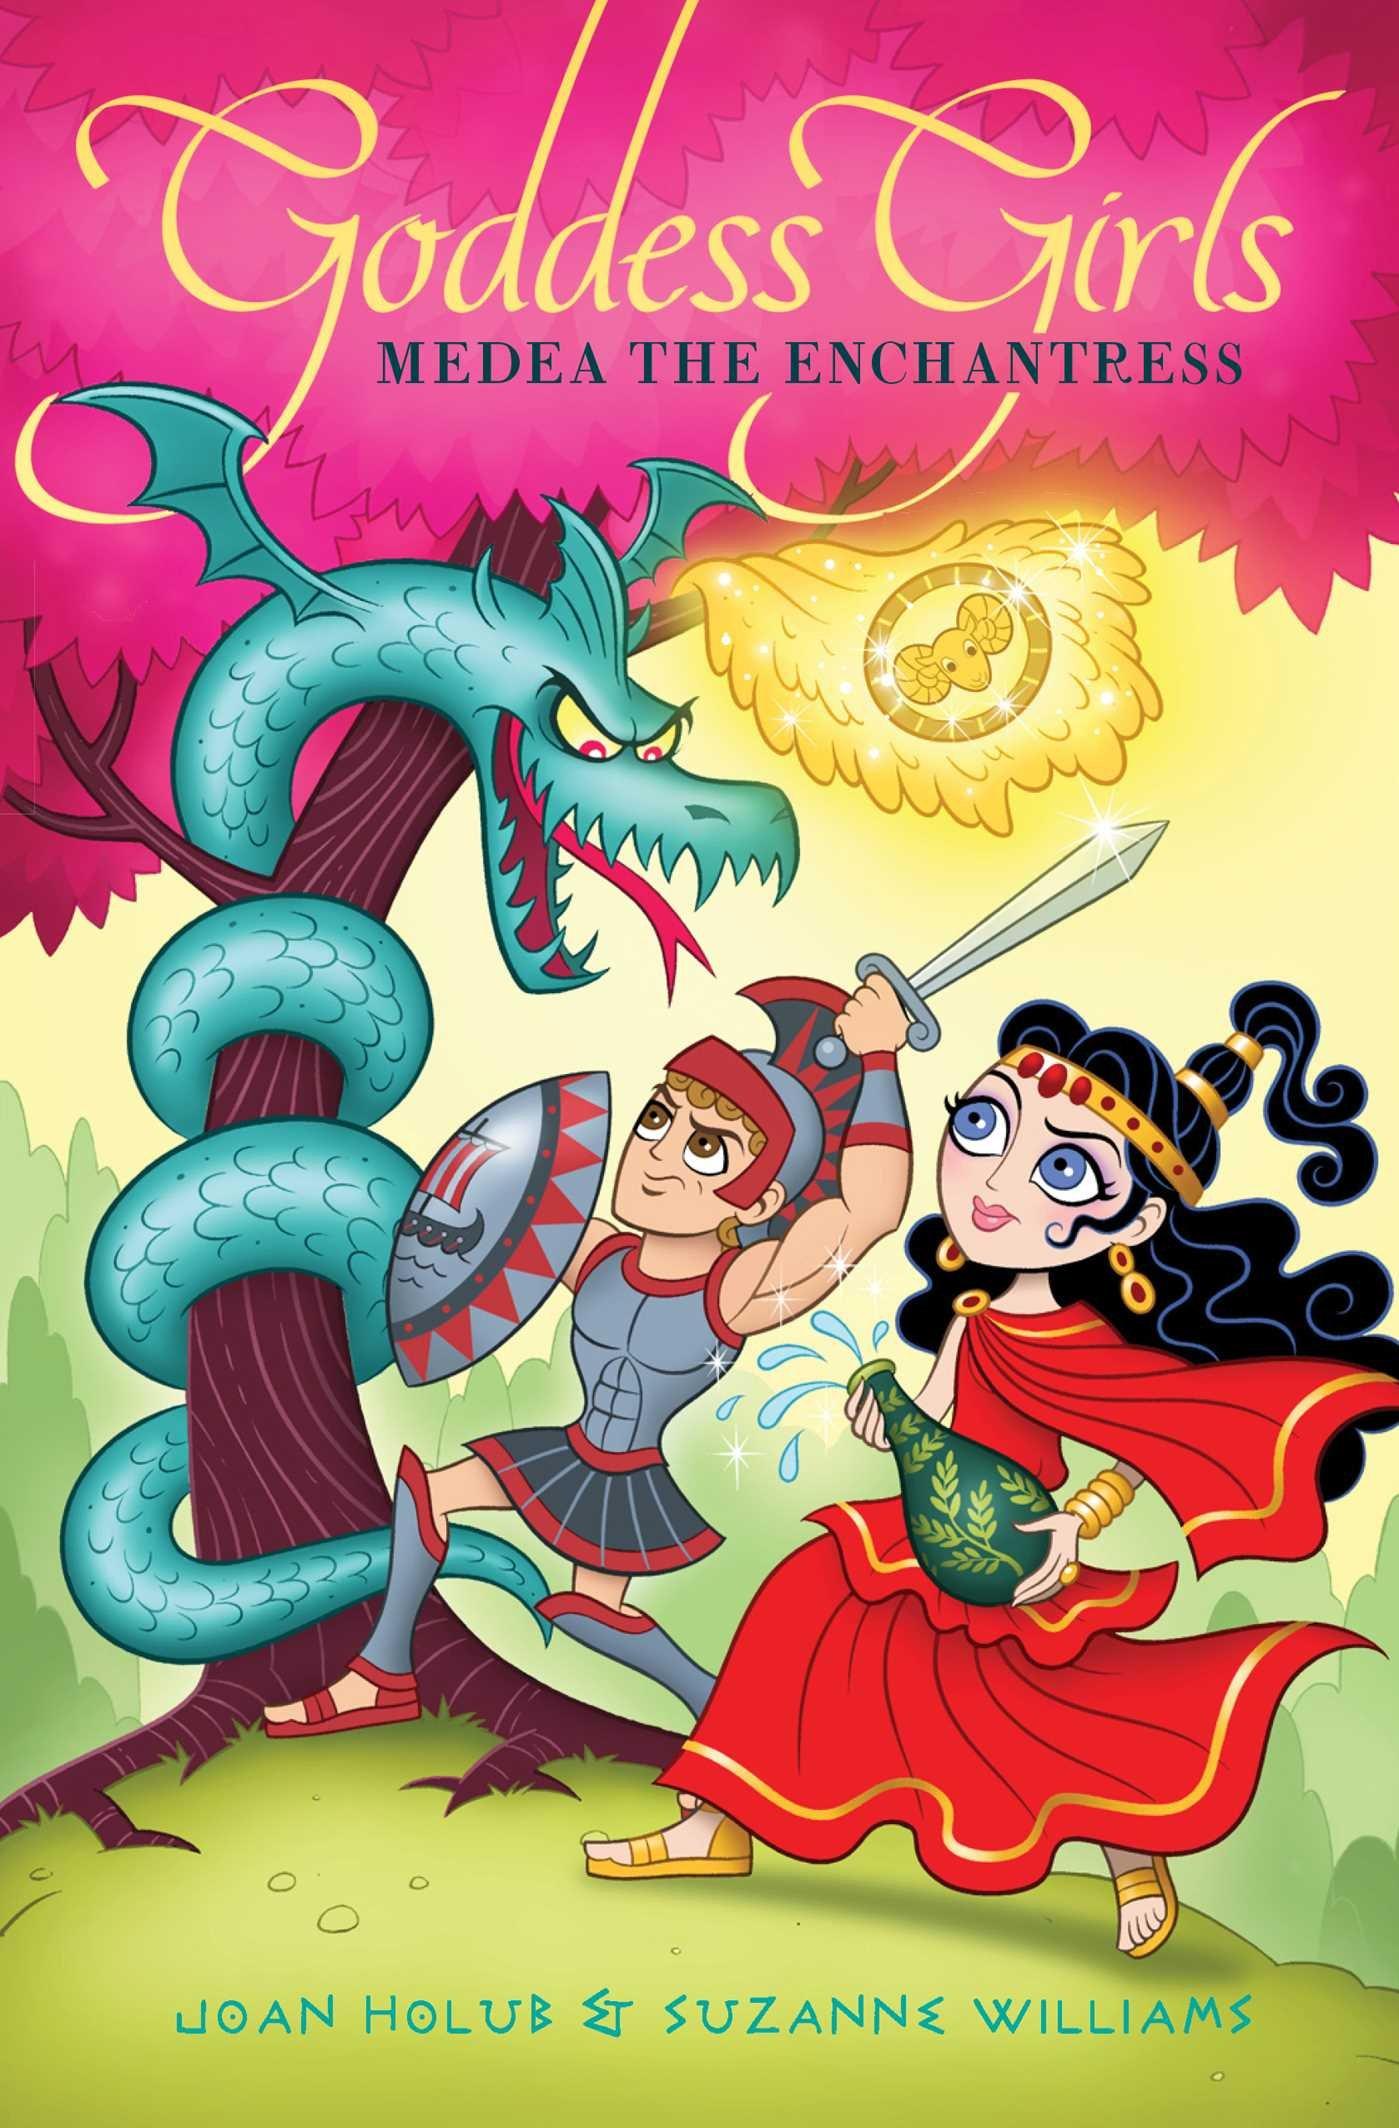 Aladdin (December 5, 2017)